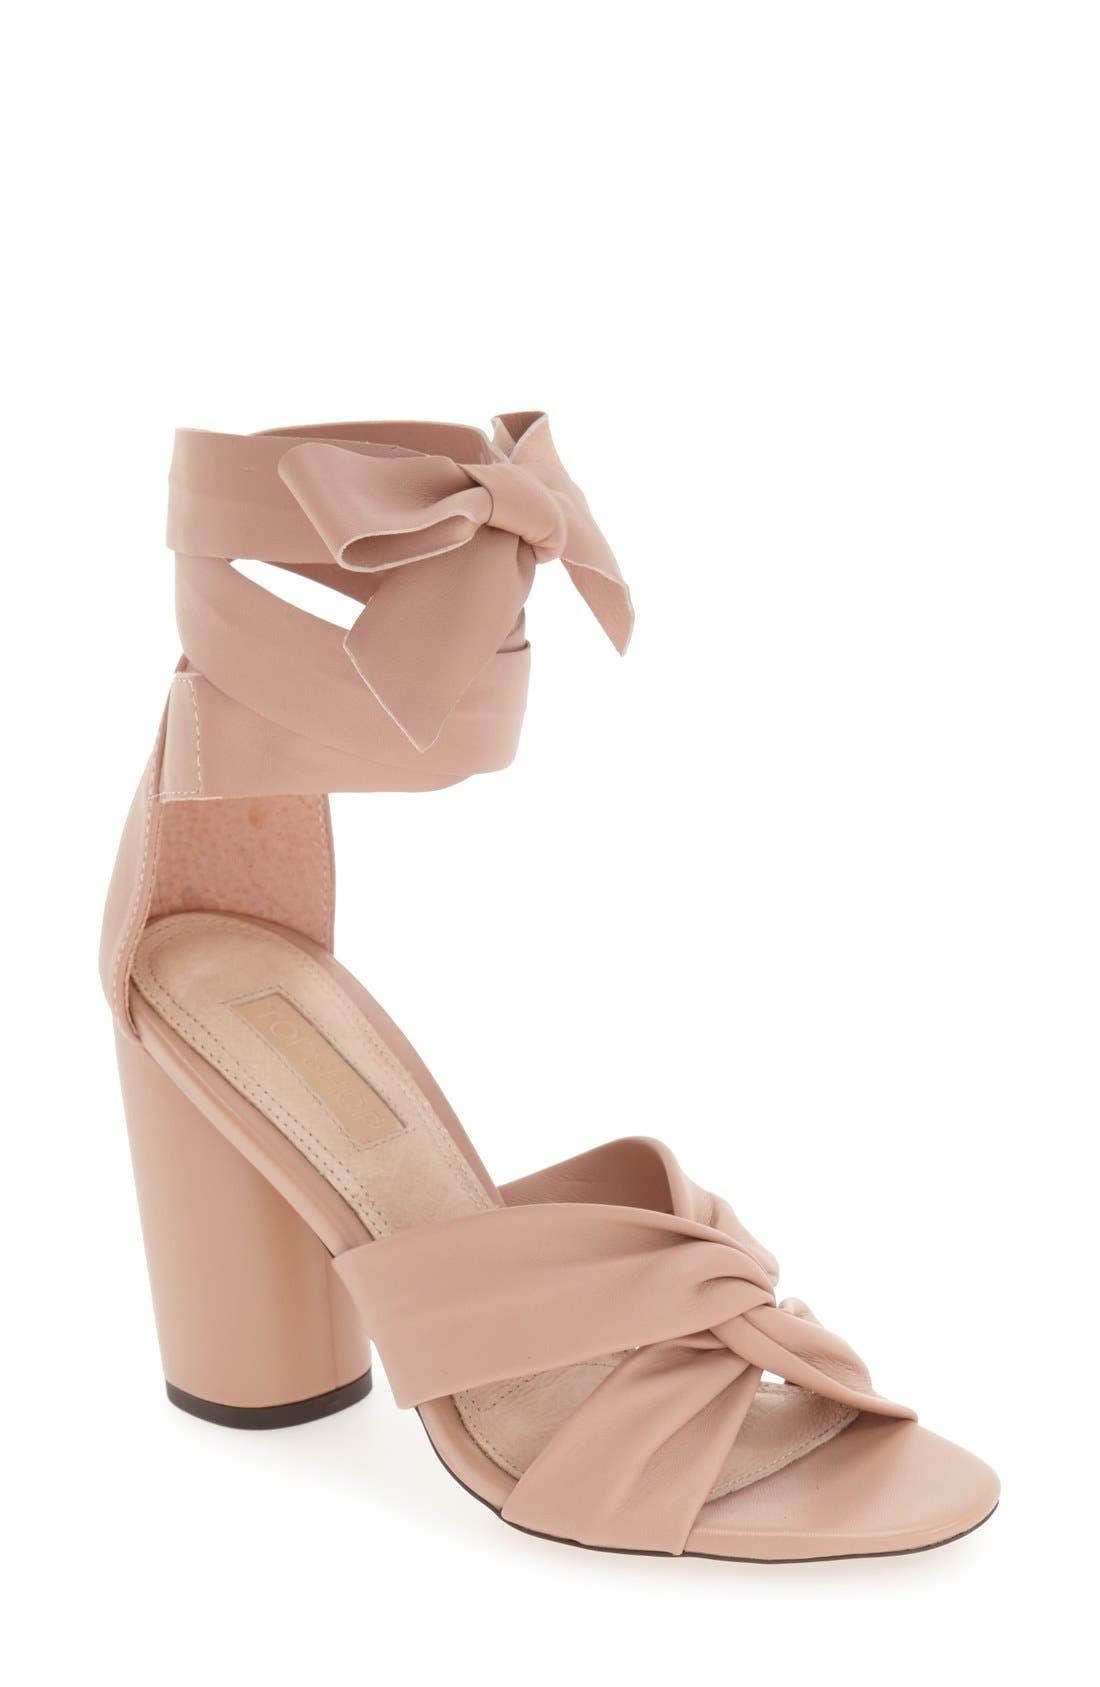 Main Image - Topshop 'Rosetta' Soft Knot Wraparound Sandal (Women)